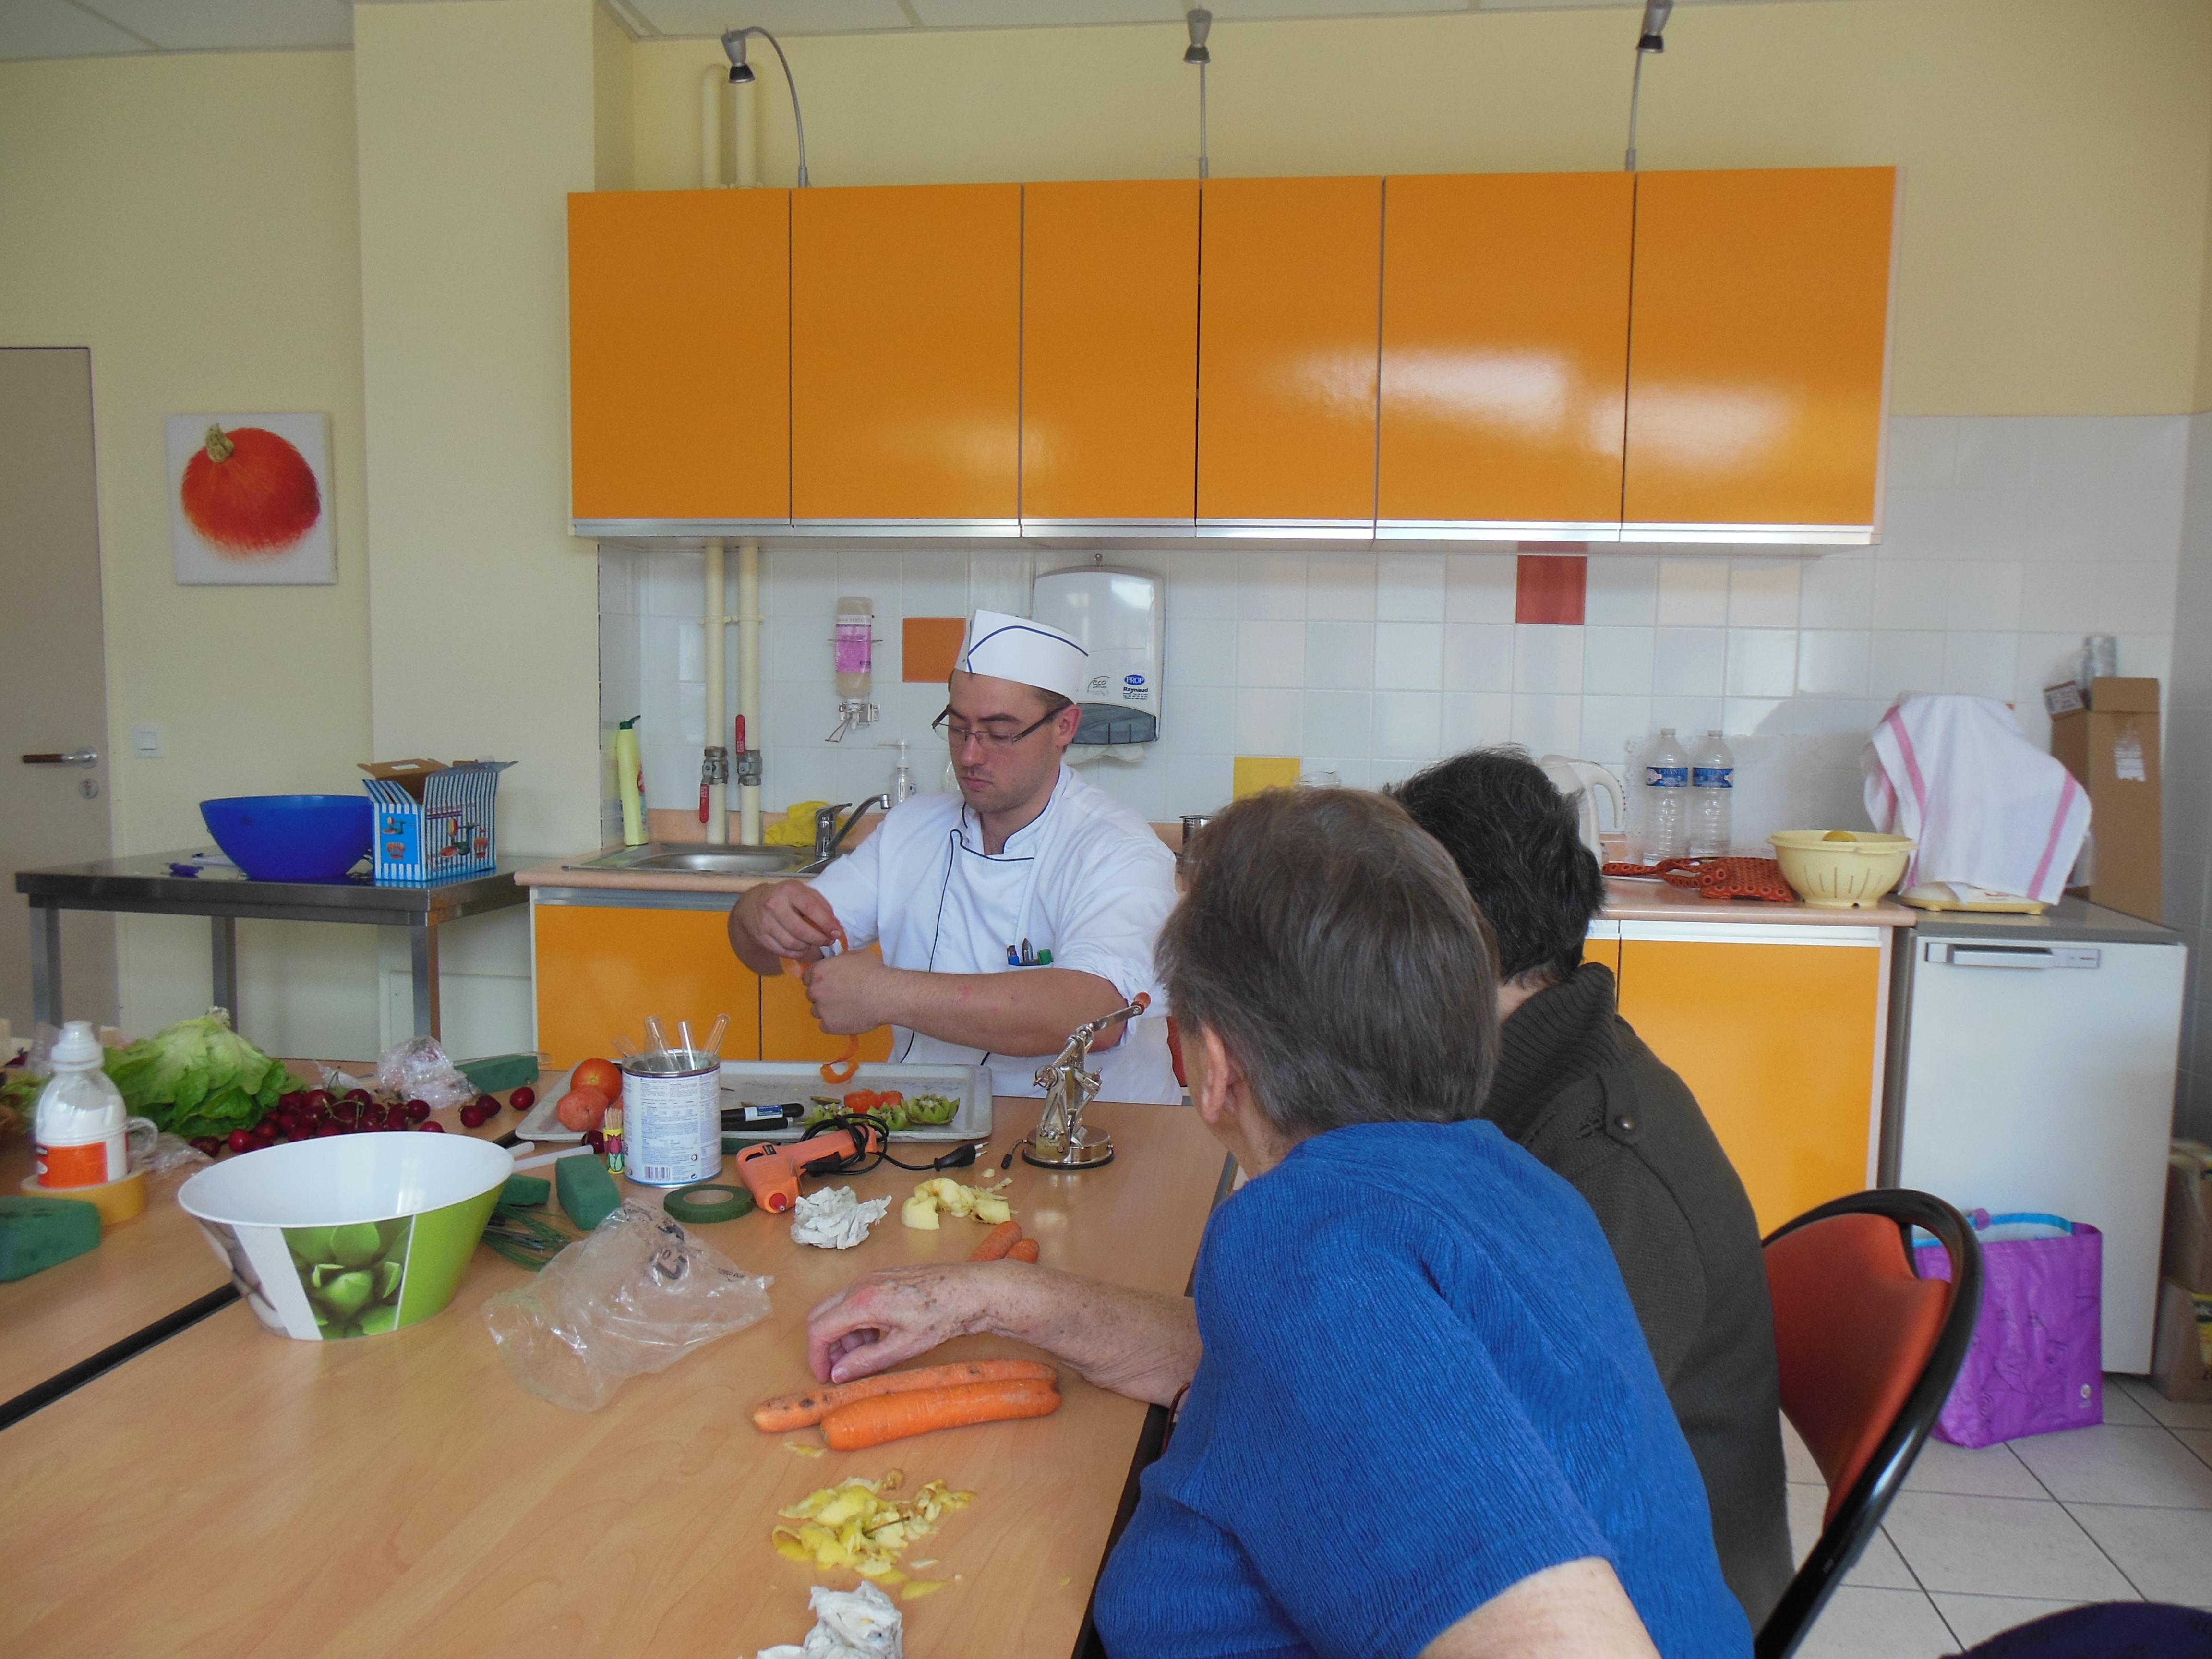 L'atelier cuisine